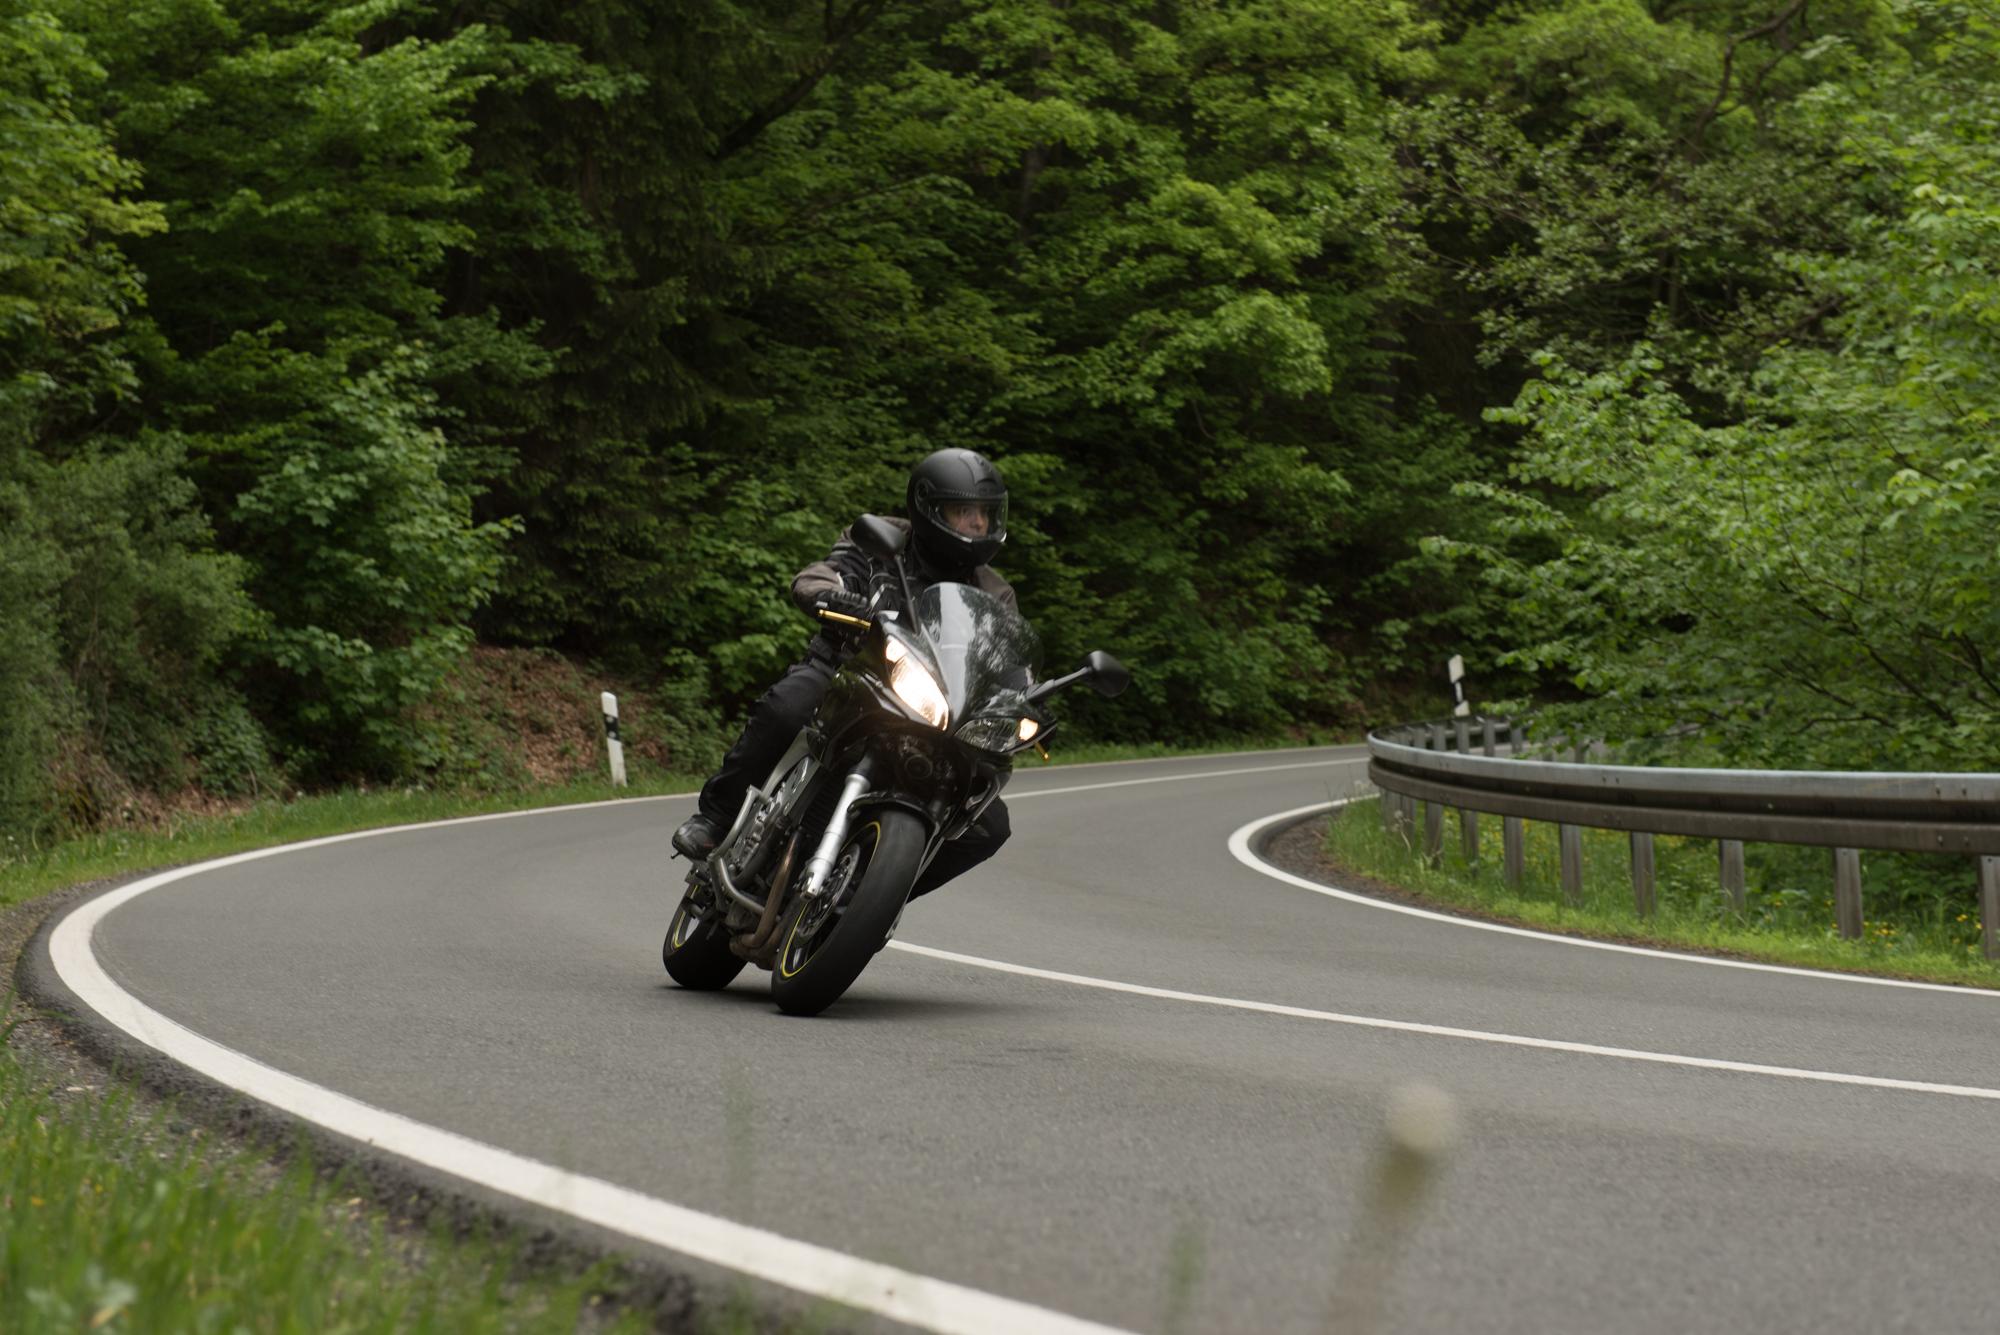 Hitting some curves (Yamaha FZ6 Fazer)